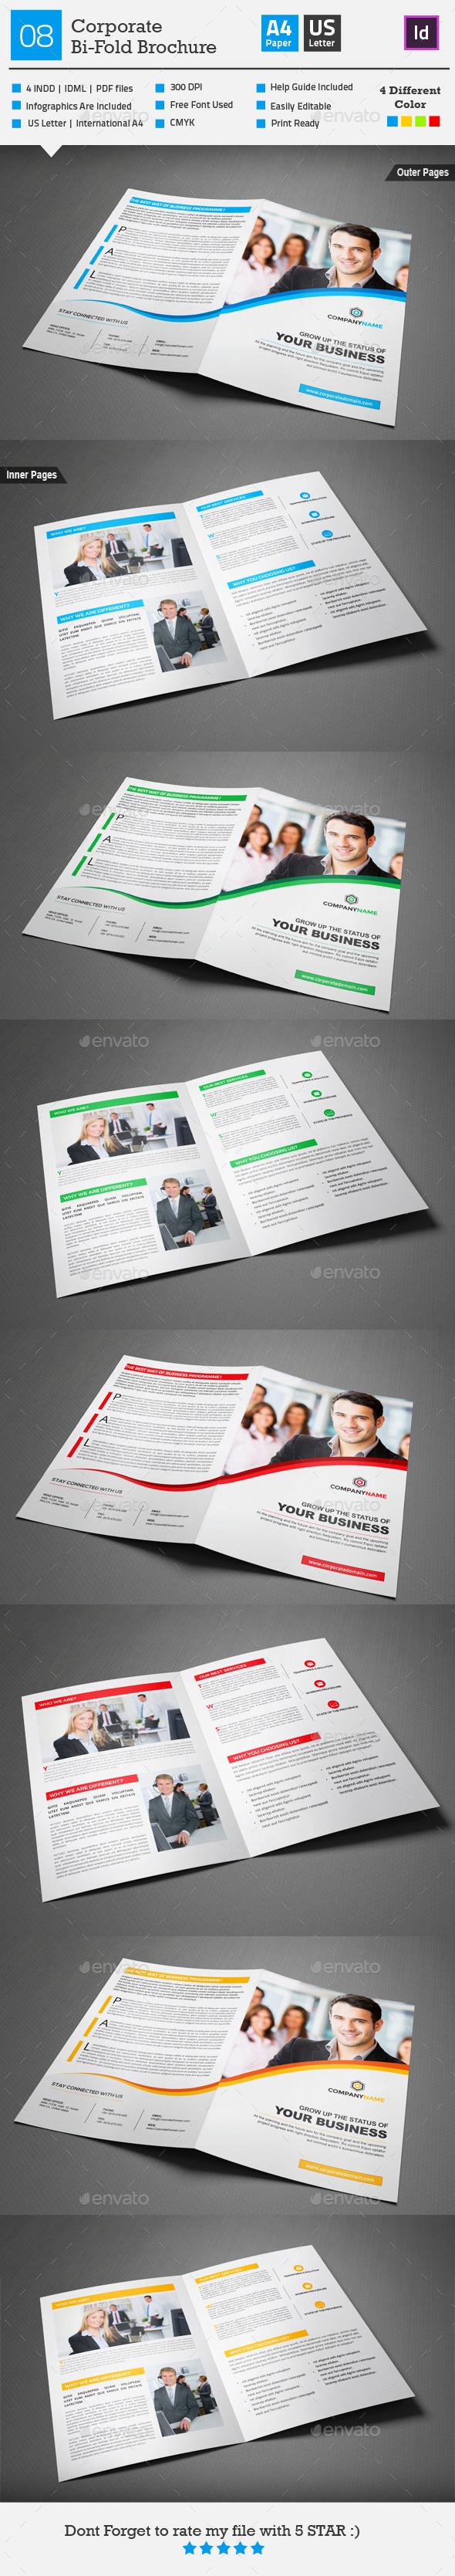 GraphicRiver Corporate Bi-fold Brochure 08 10234656